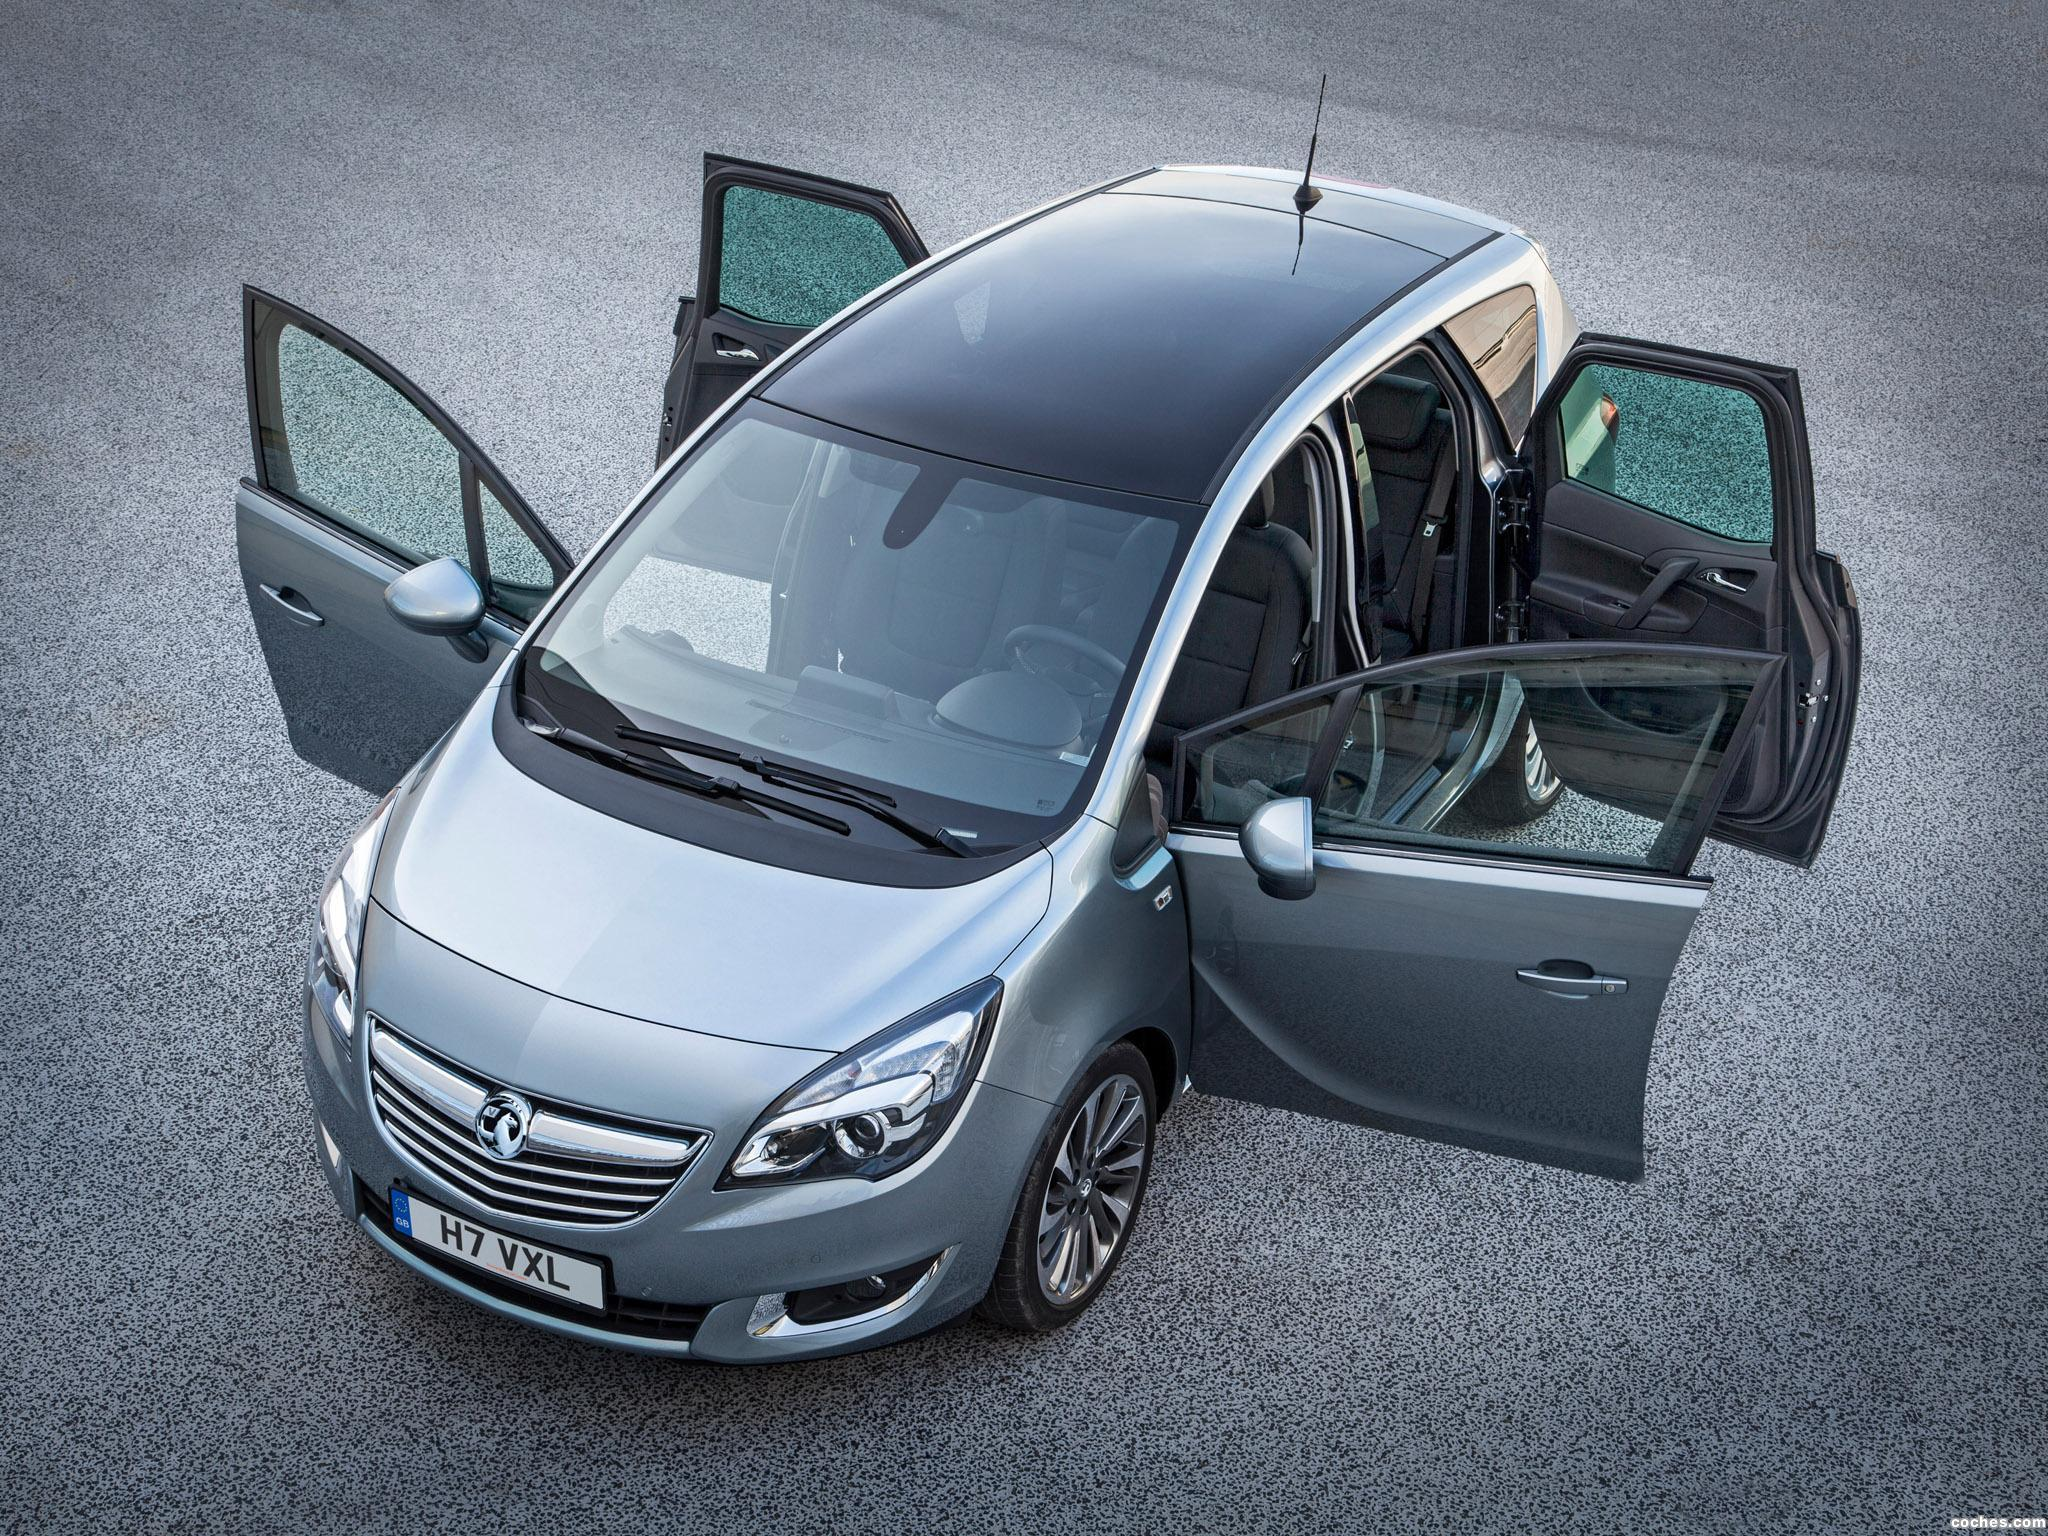 Foto 0 de Vauxhall Meriva 2014